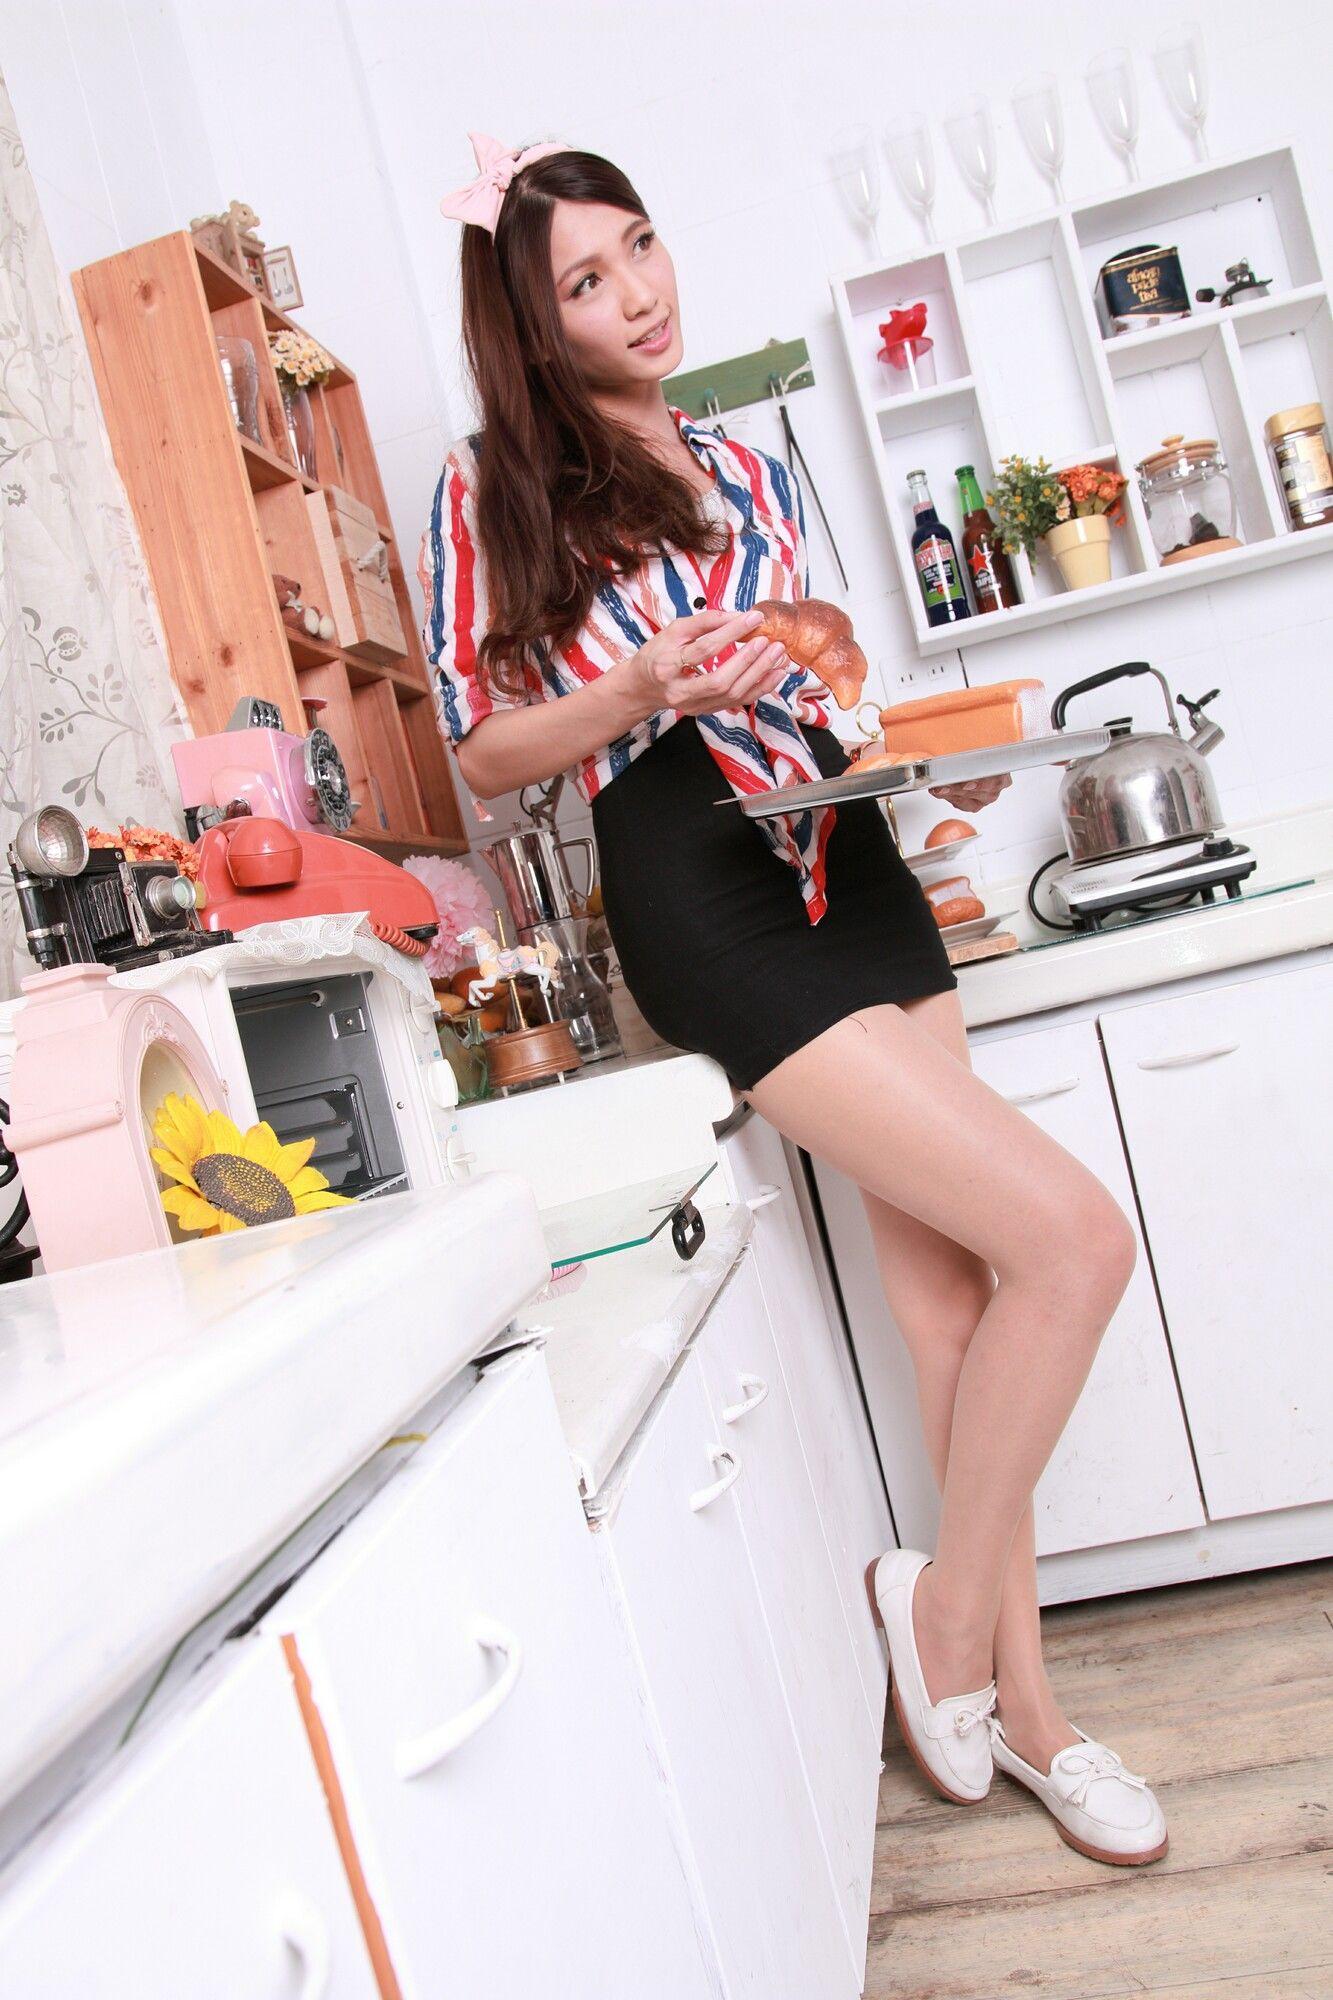 VOL.743 [台湾正妹]可爱萌女:蔡译心(Candice)超高清个人性感漂亮大图(100P)